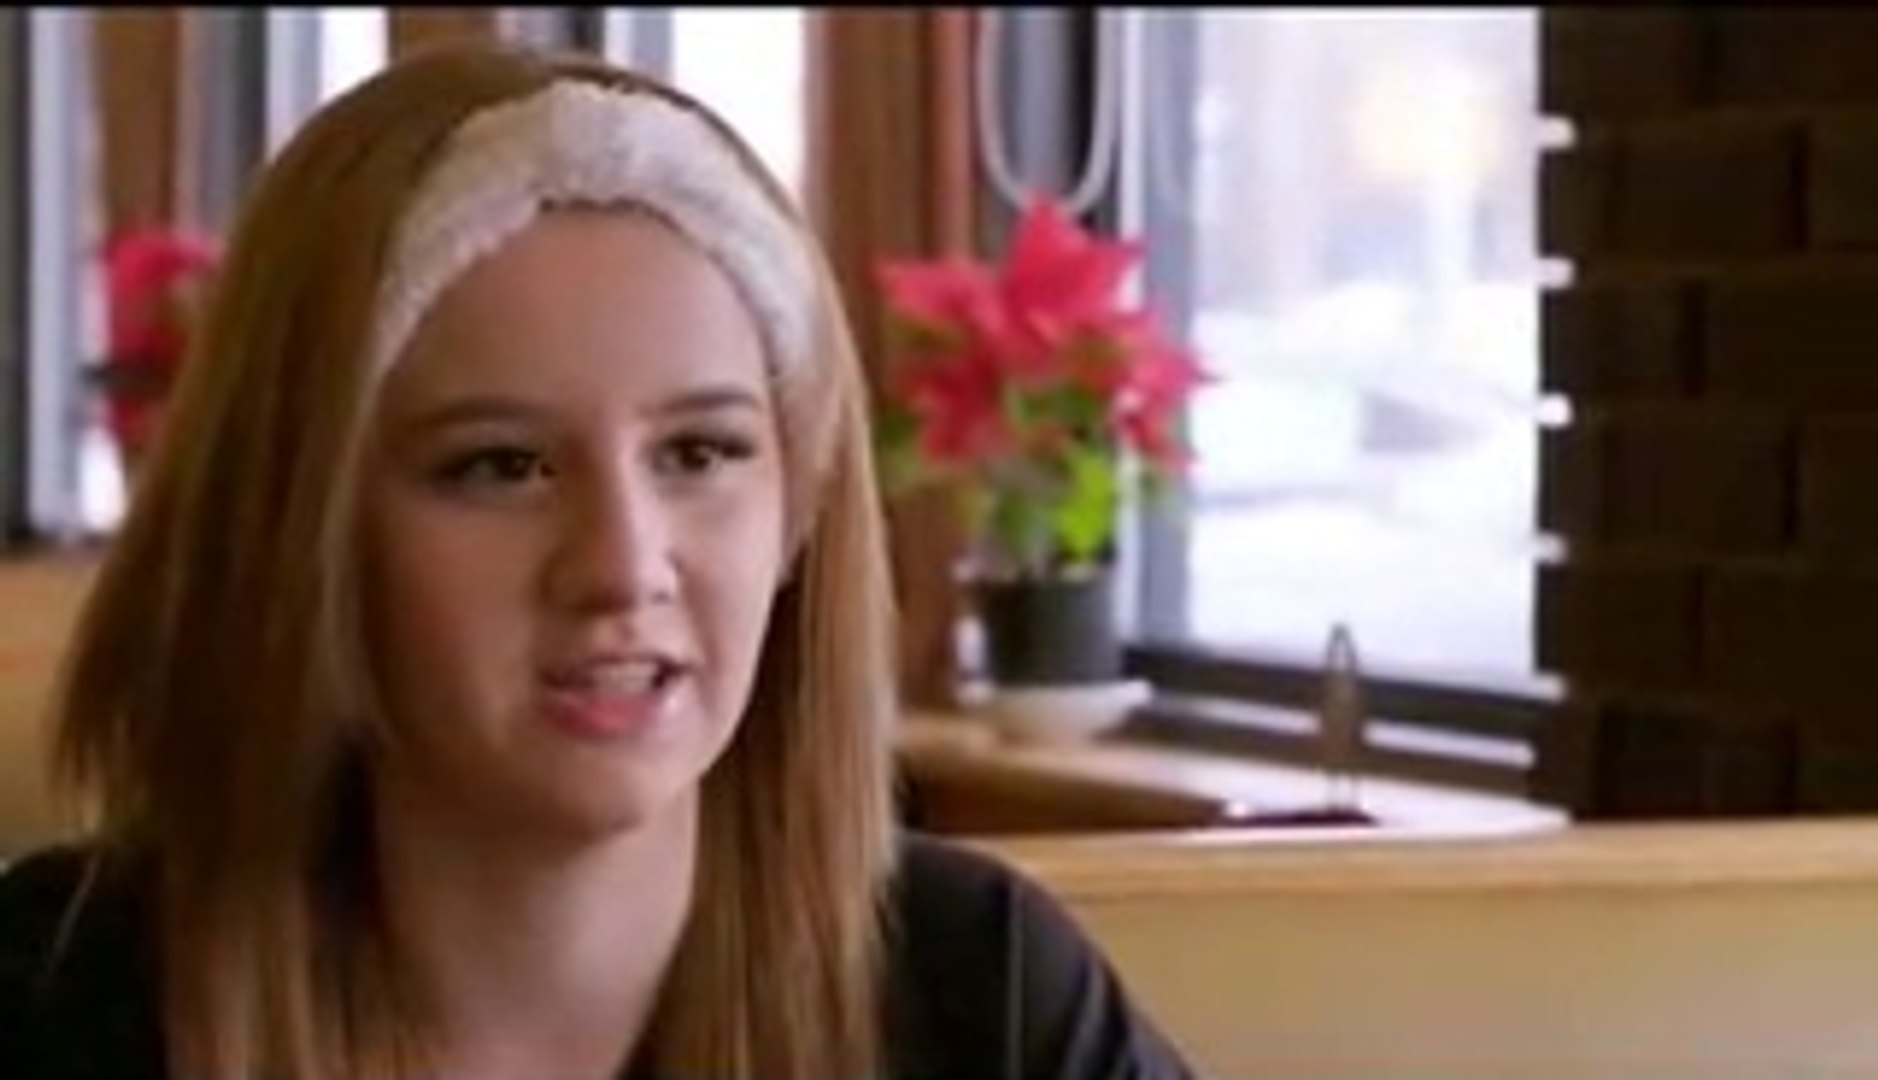 Teen Mom Young + Pregnant Season 1 Episode 12 - Pomp and Circumstance || Teen Mom Young + Pregnant 1